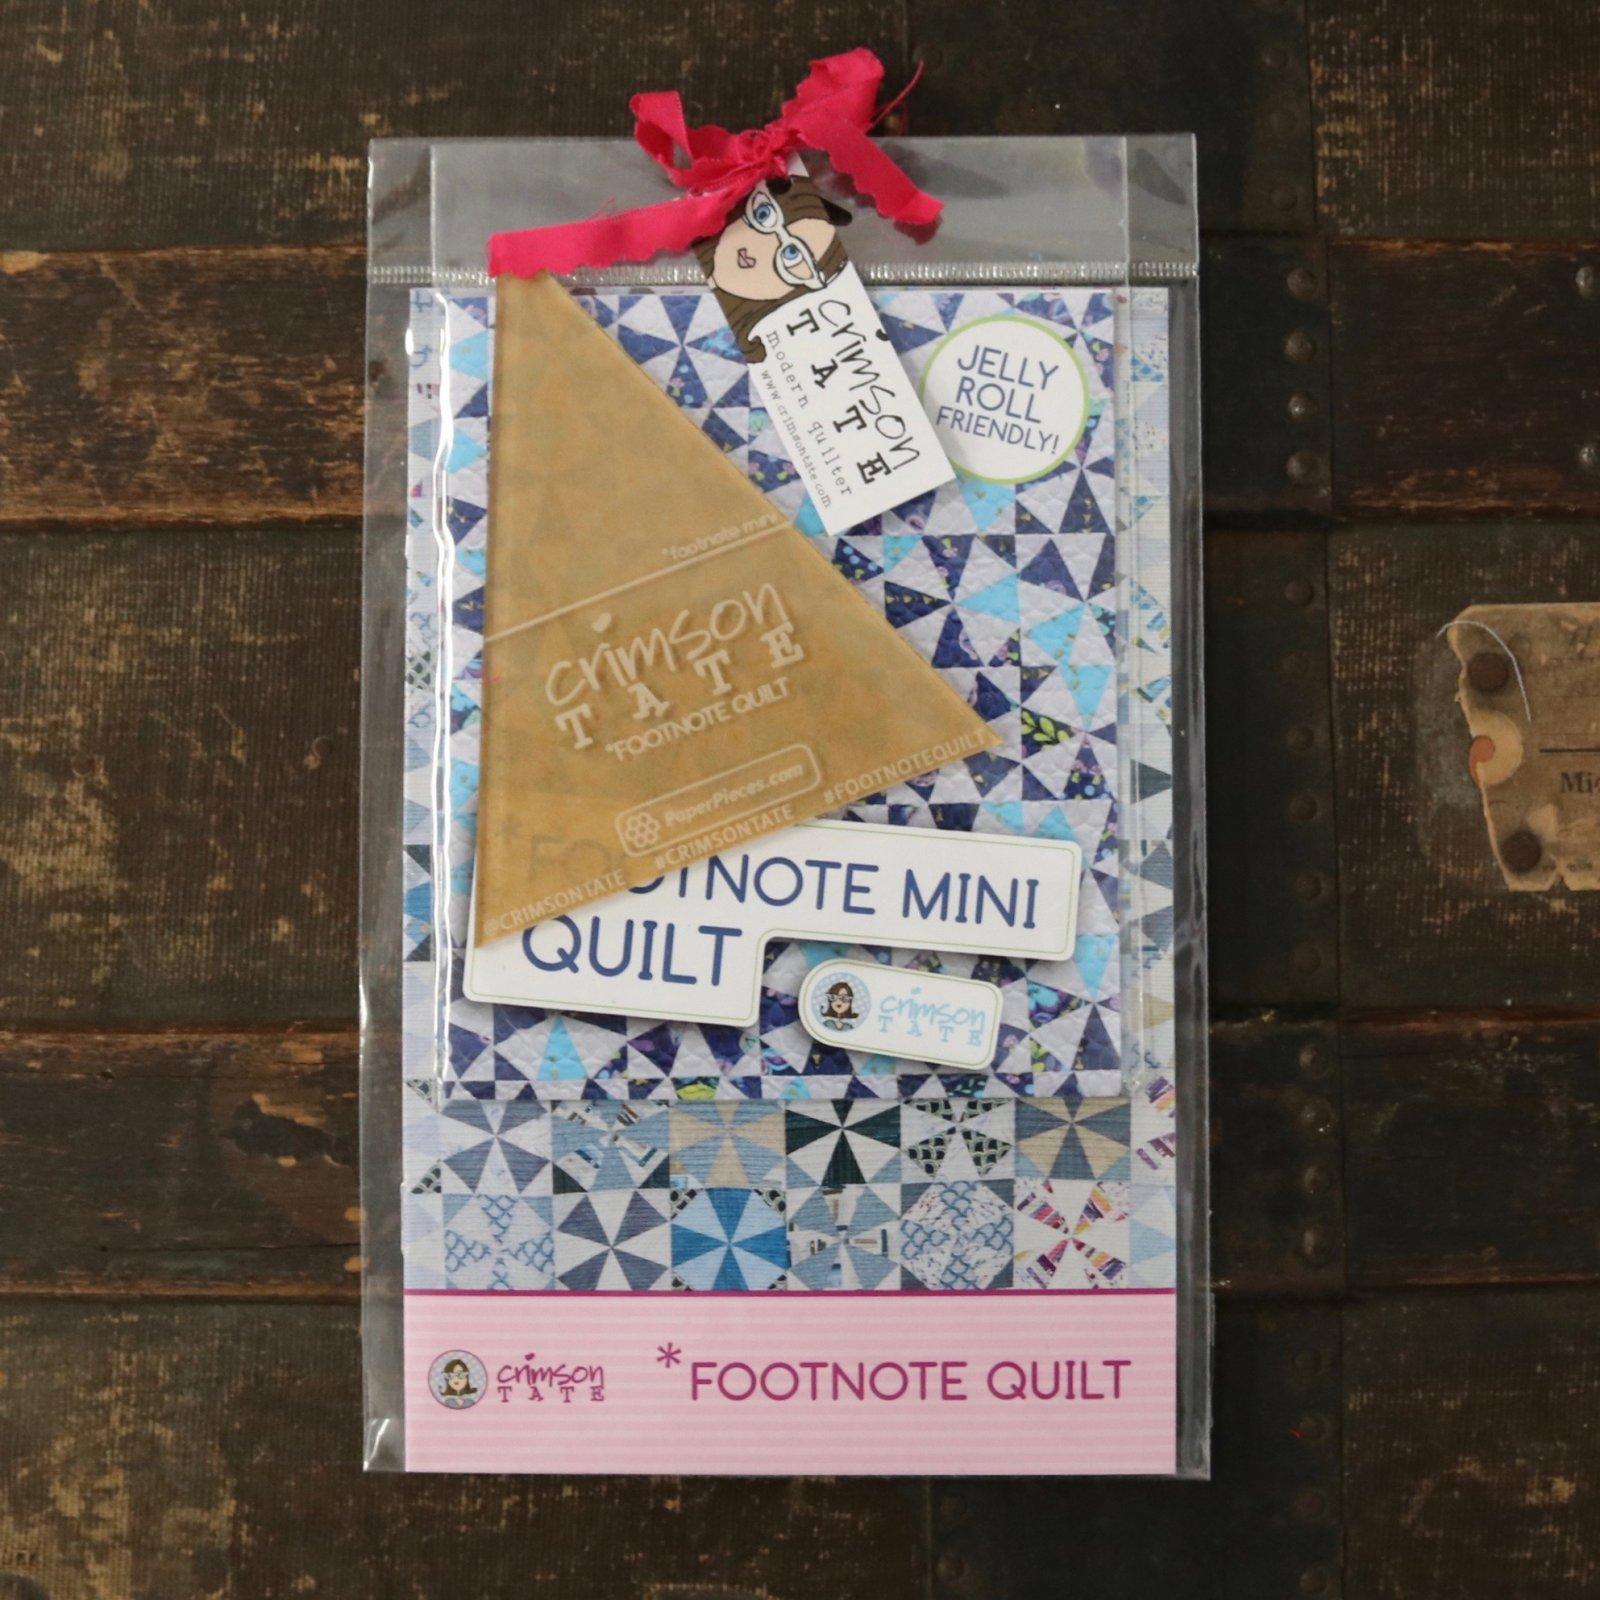 *Footnote + *Footnote Mini Starter Kit